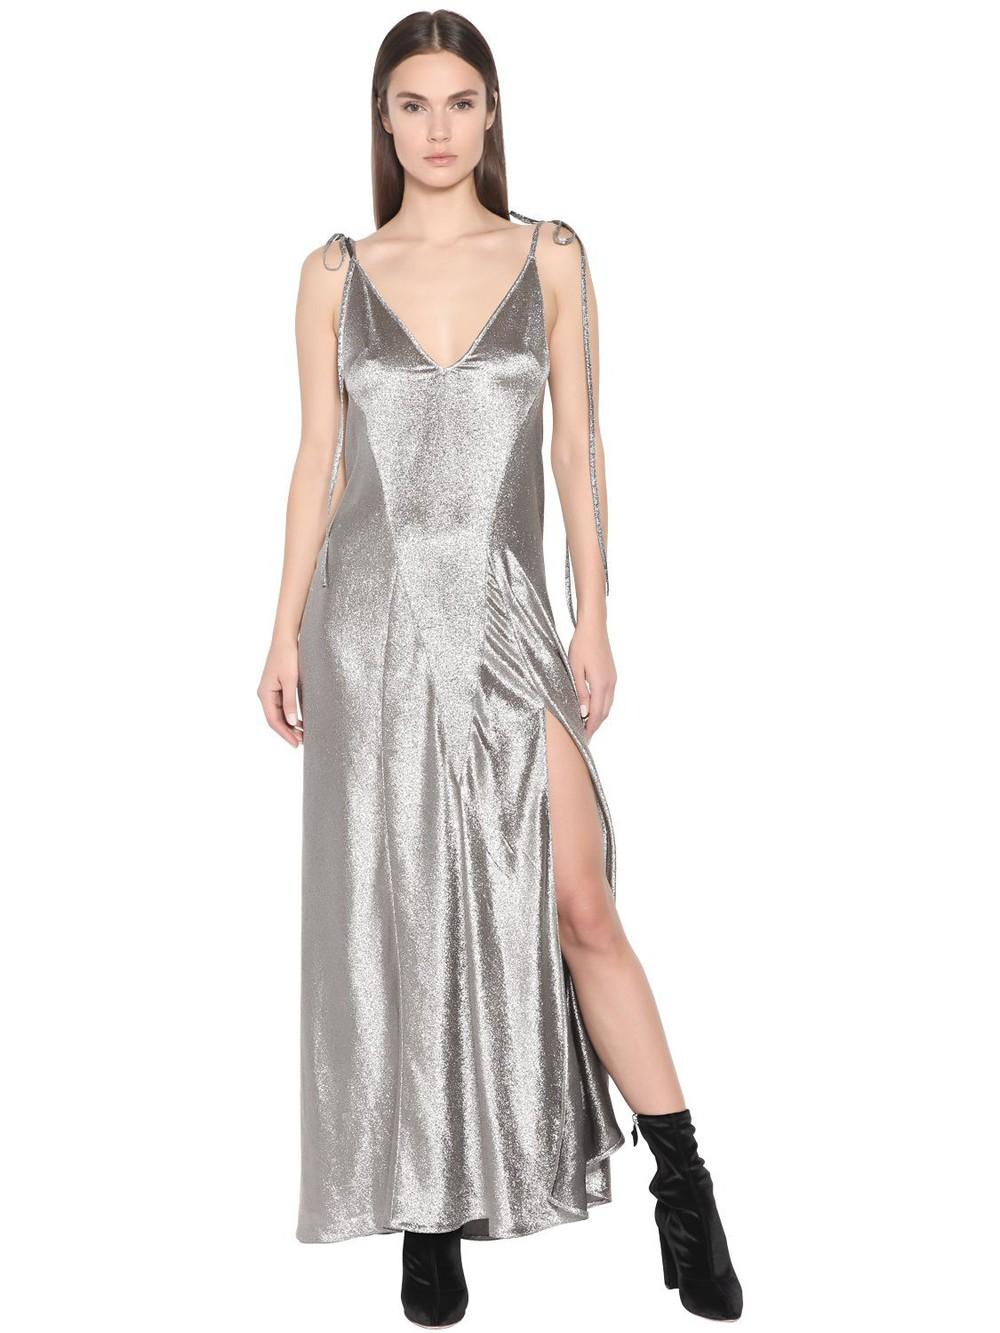 Attico Velvet Wrap Dress In Teal Wheretoget